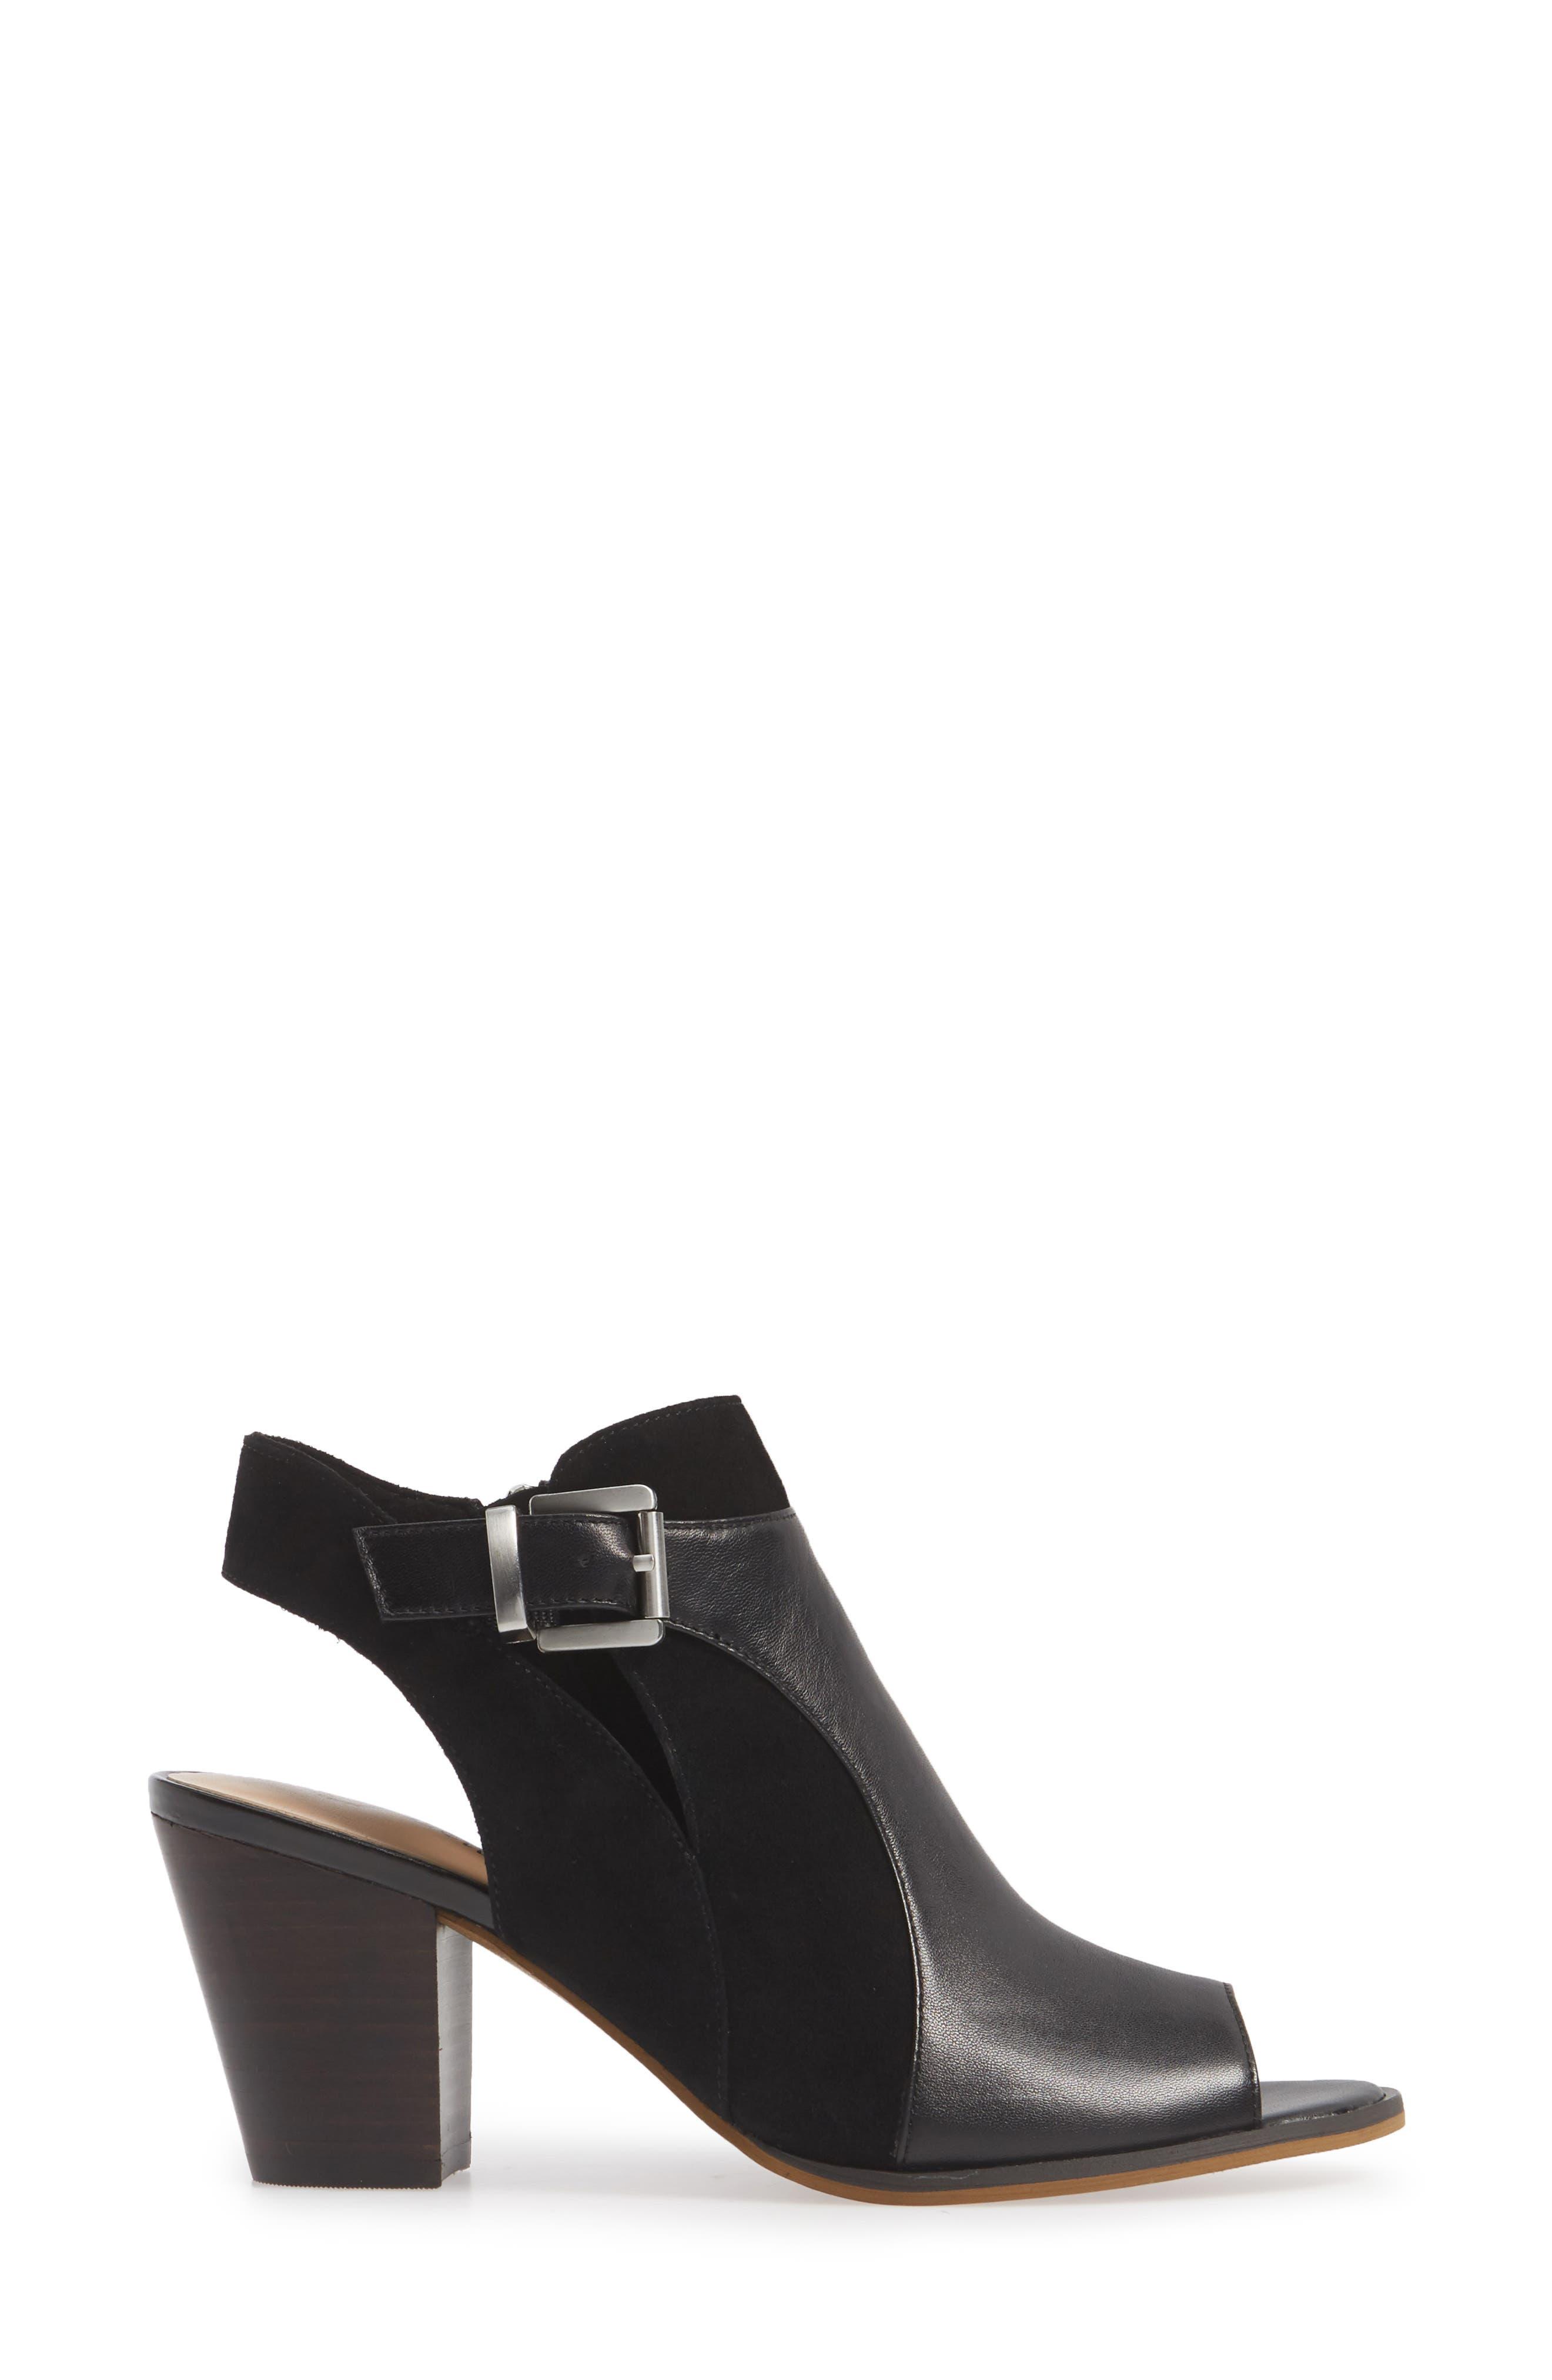 BELLA VITA, Kellan Mixed Finish Sandal, Alternate thumbnail 3, color, BLACK LEATHER/ SUEDE